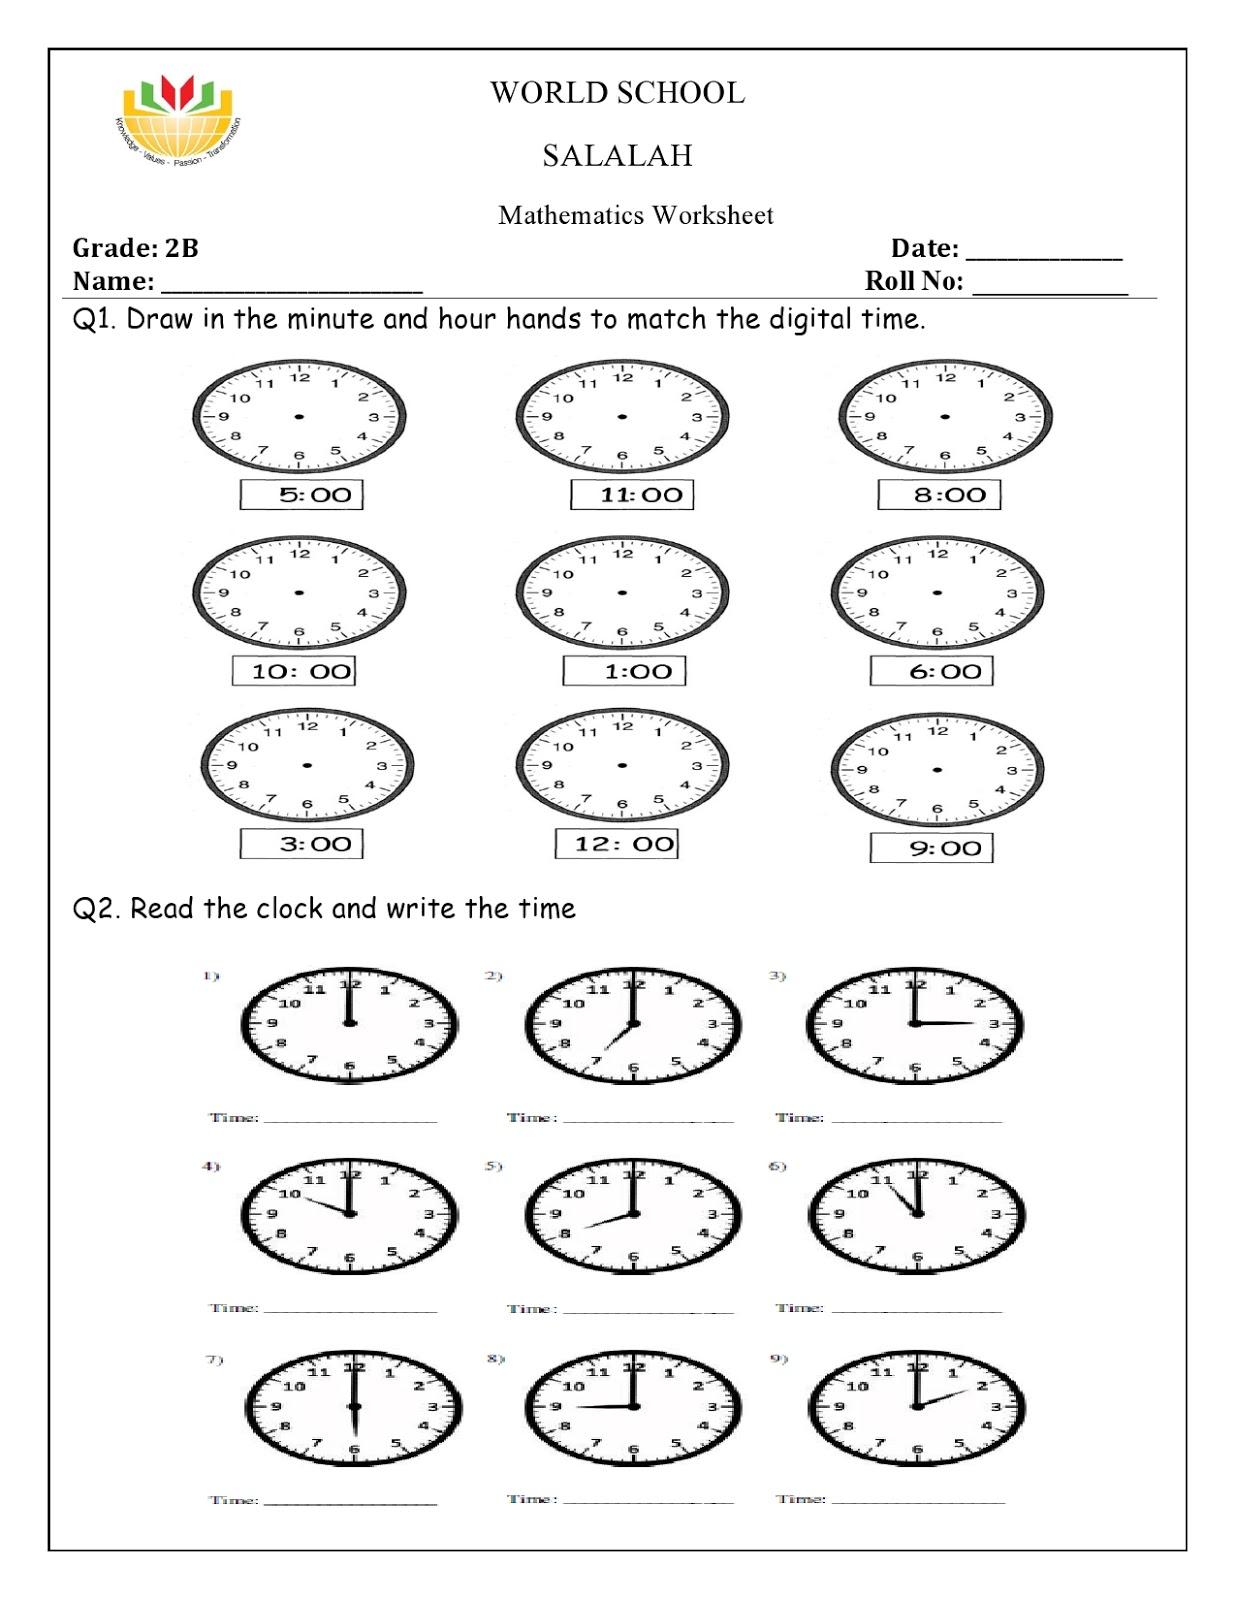 Birla World School Oman Homework For Grade 2 As On 25 02